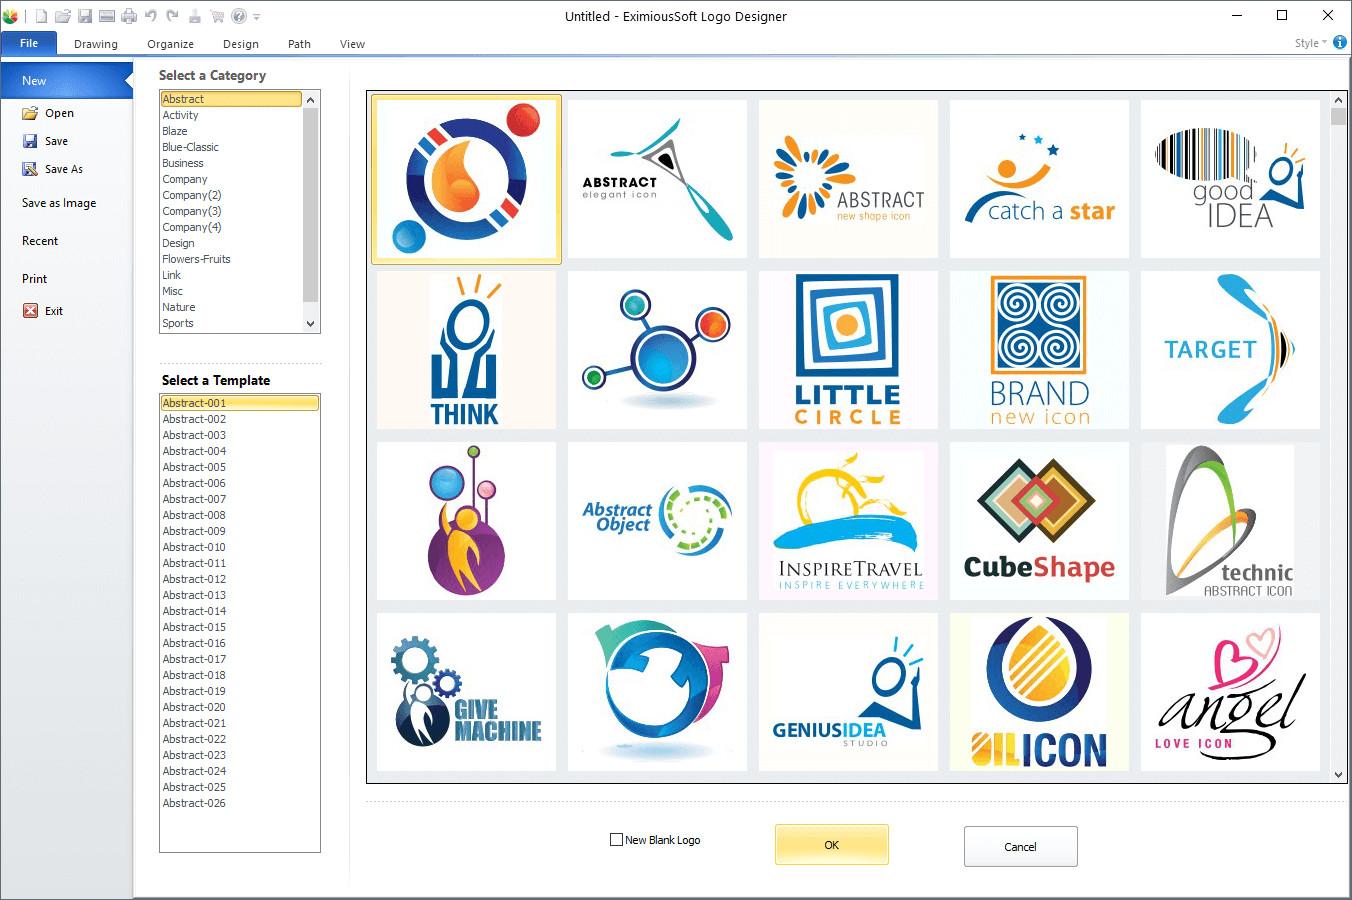 EximiousSoft Logo Designer Portable 3.8.8 ~ portable apps - photo#11